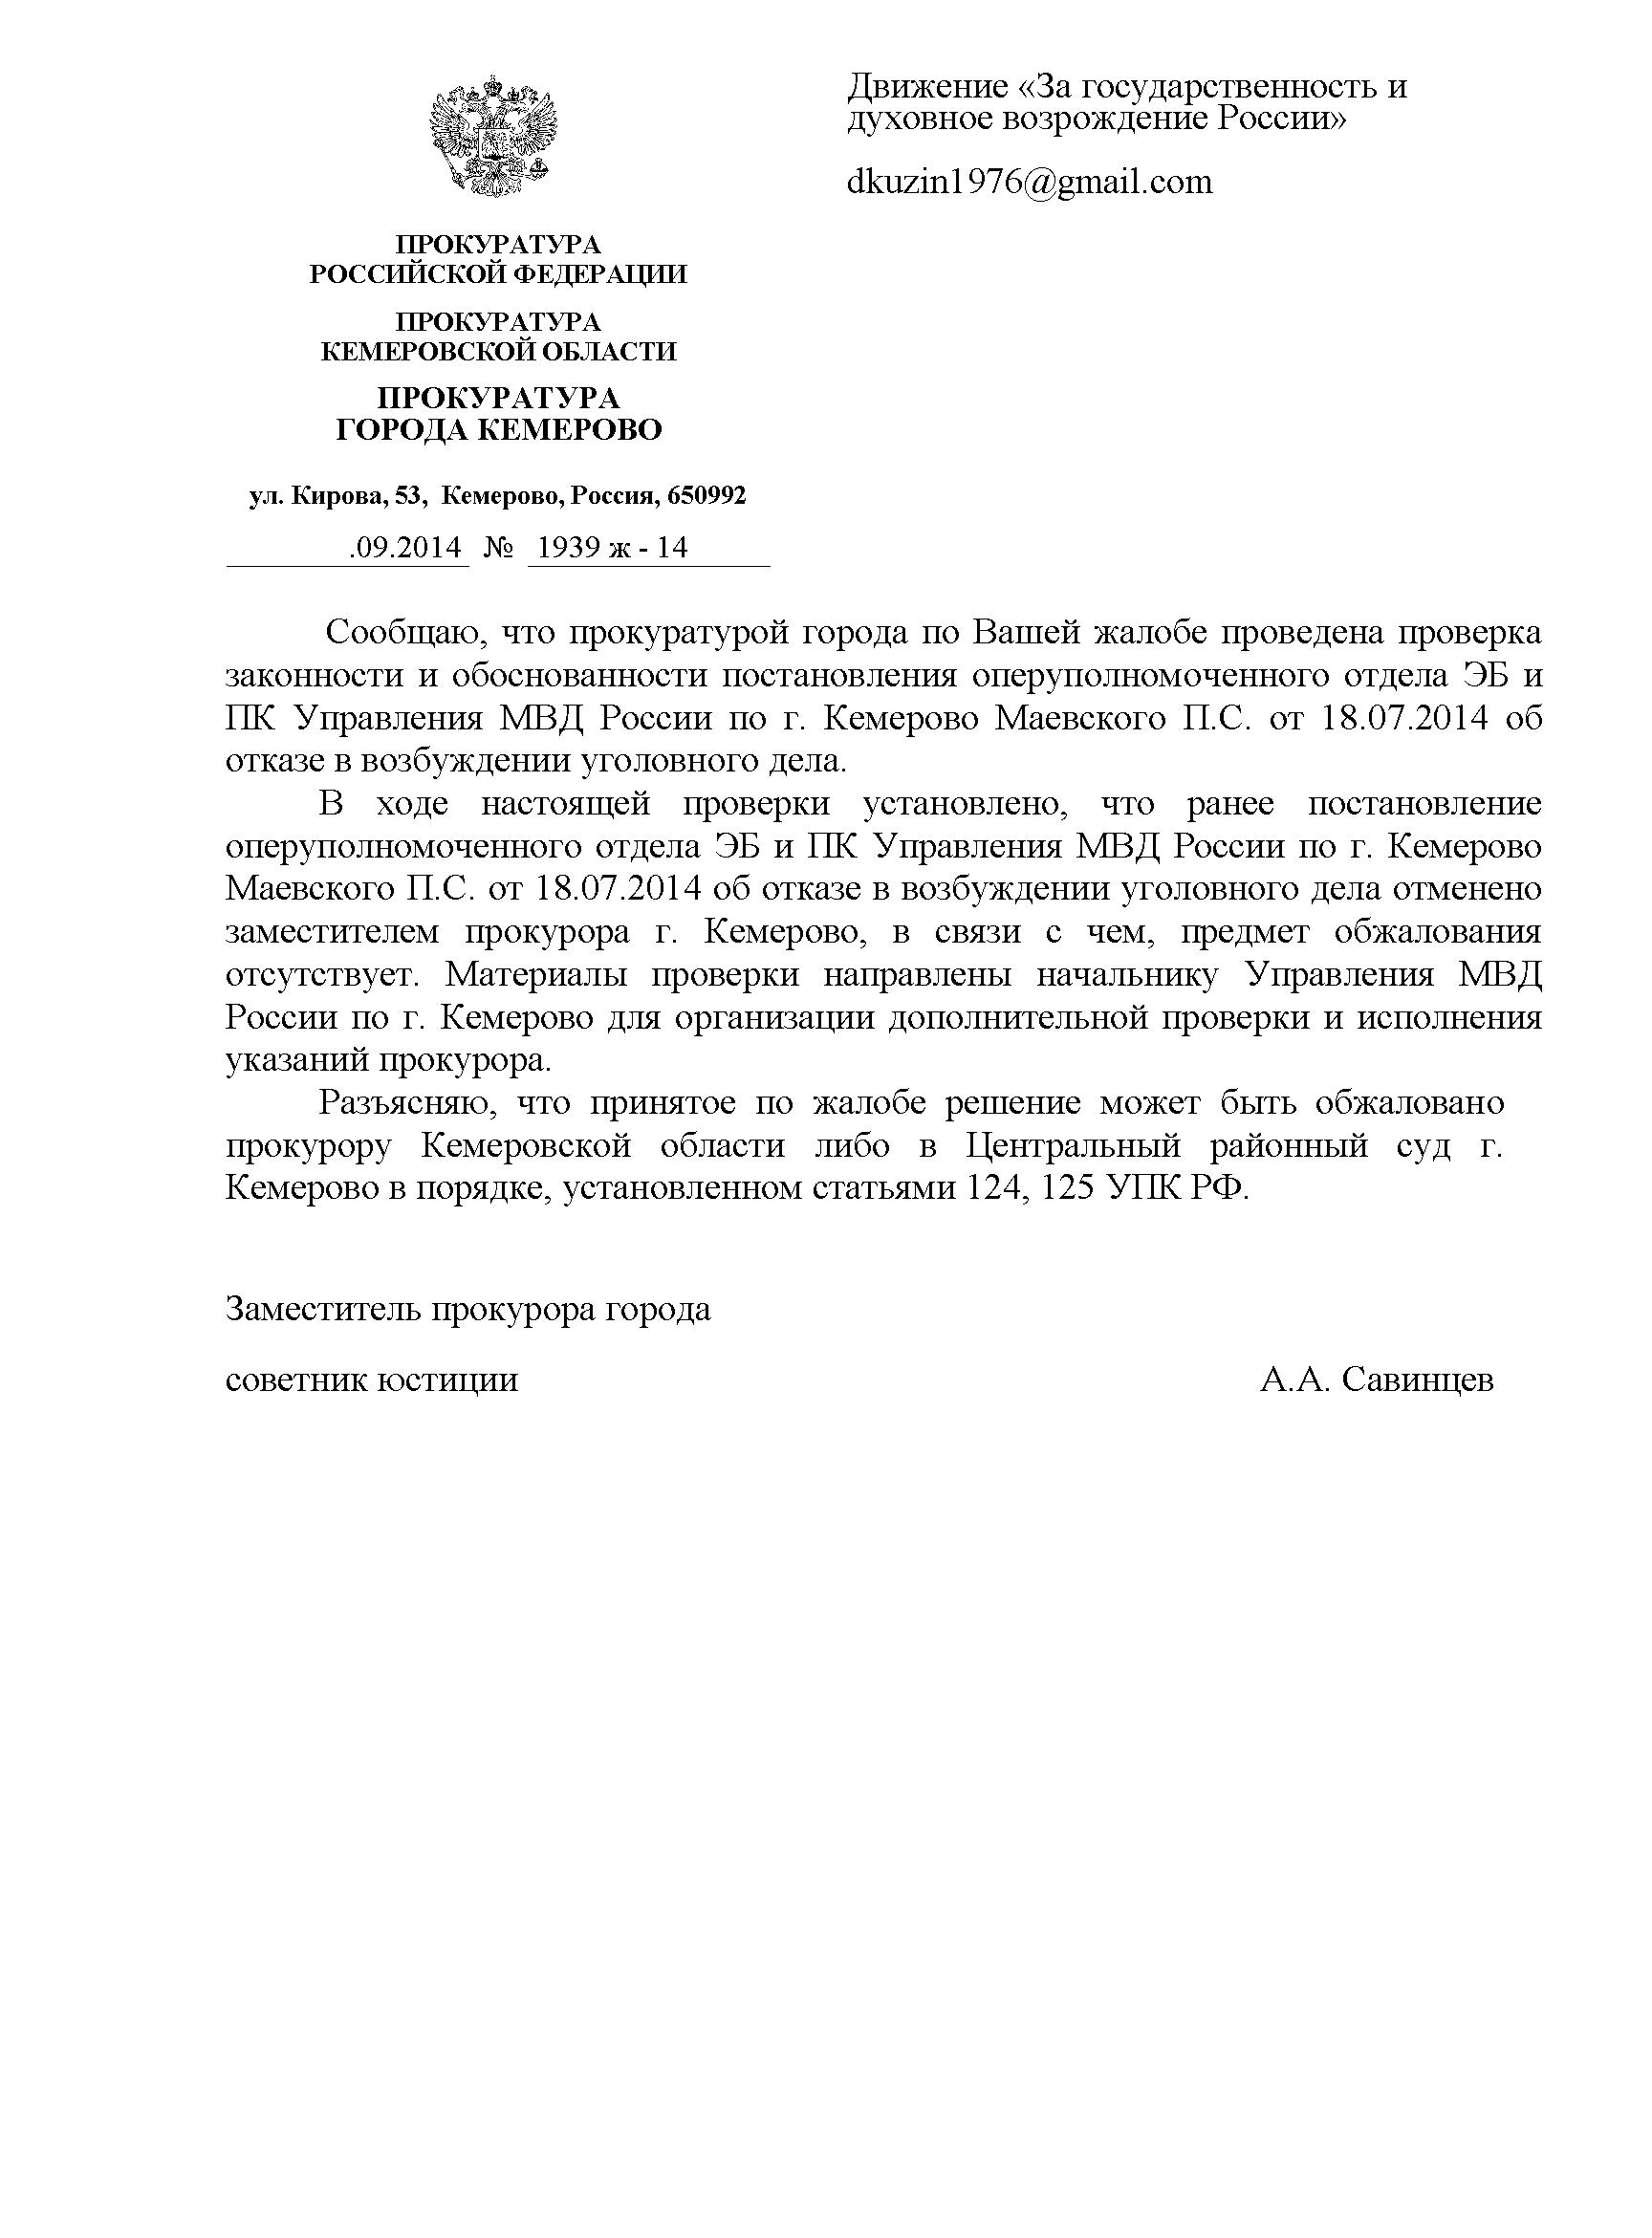 Движение За государств...... {2014-09-29} (page 1)